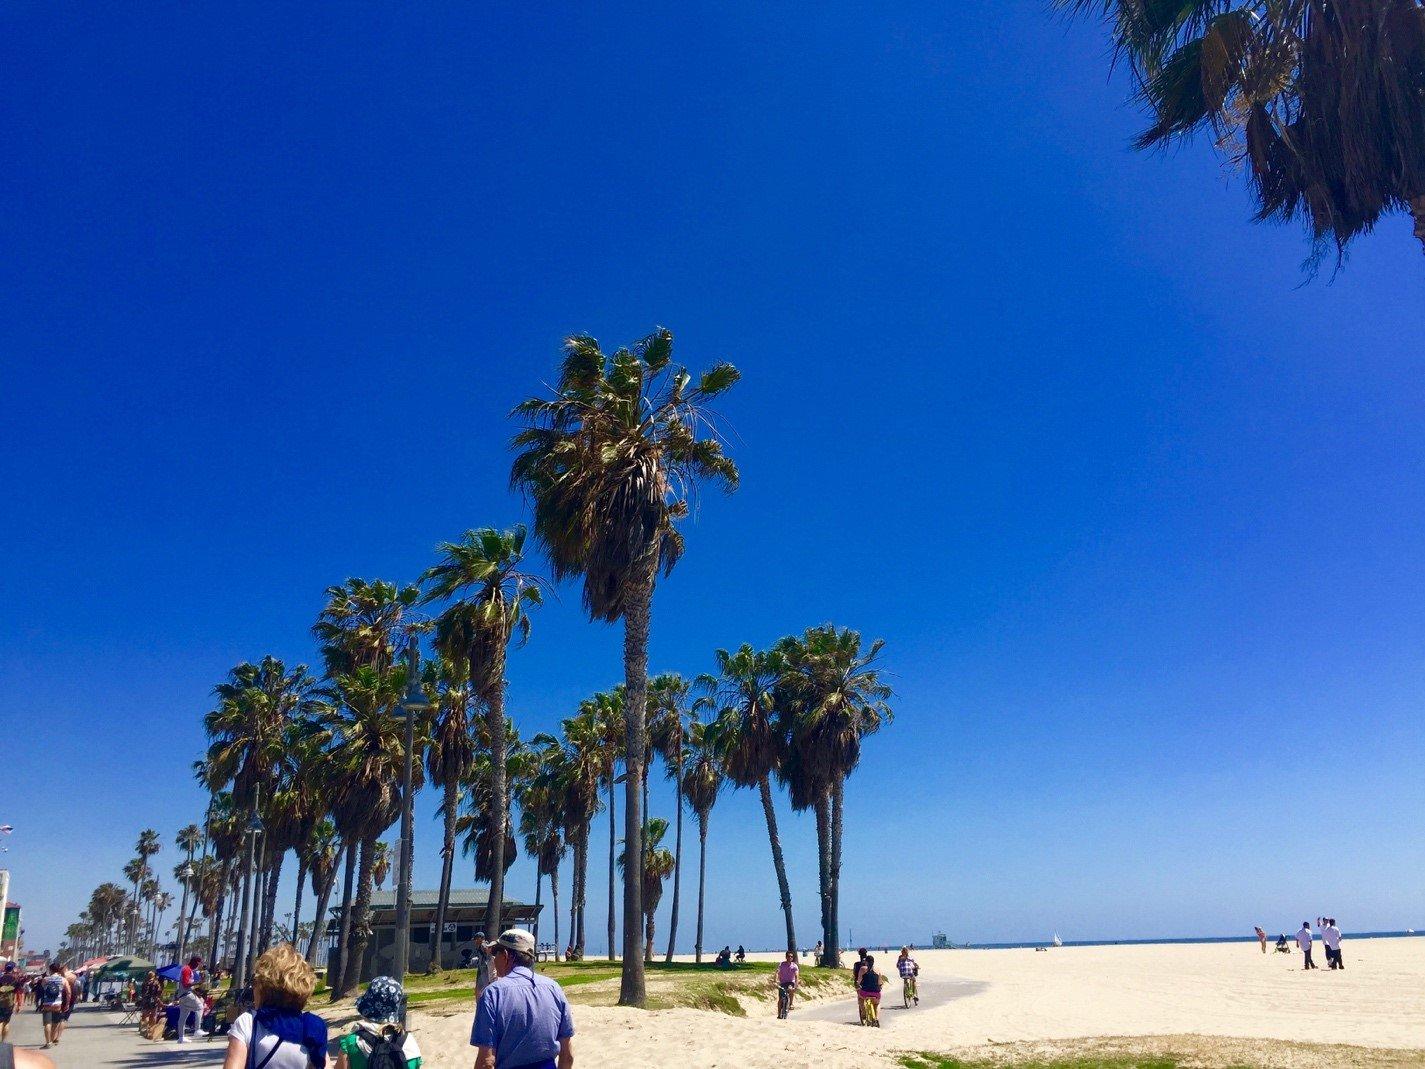 CAPAStudyAbroad_Emily_Kearns_on_Travel_in_California3.jpg